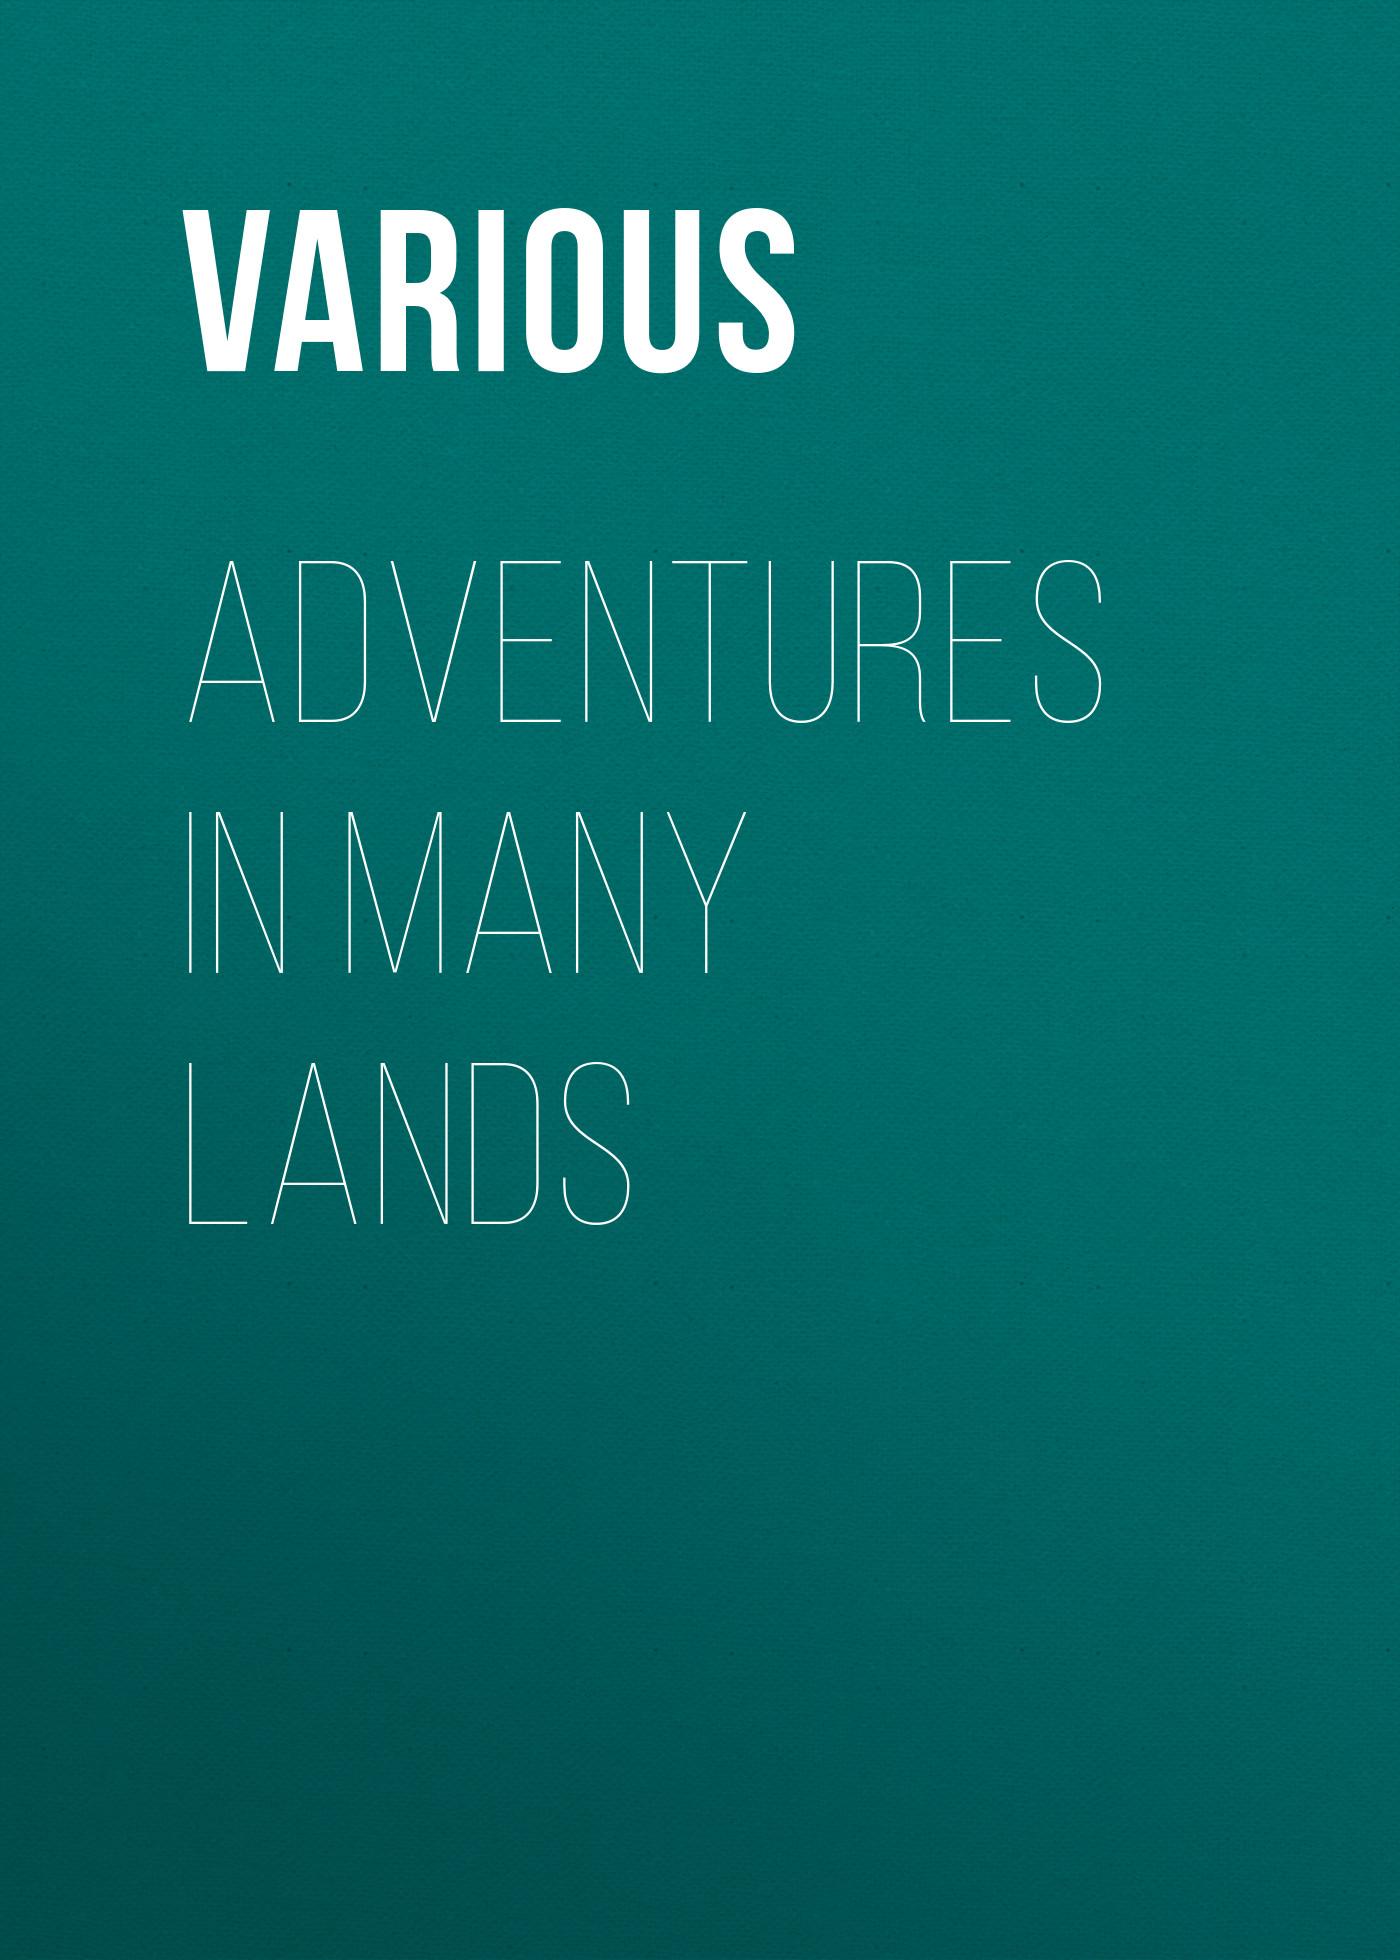 лучшая цена Various Adventures in Many Lands